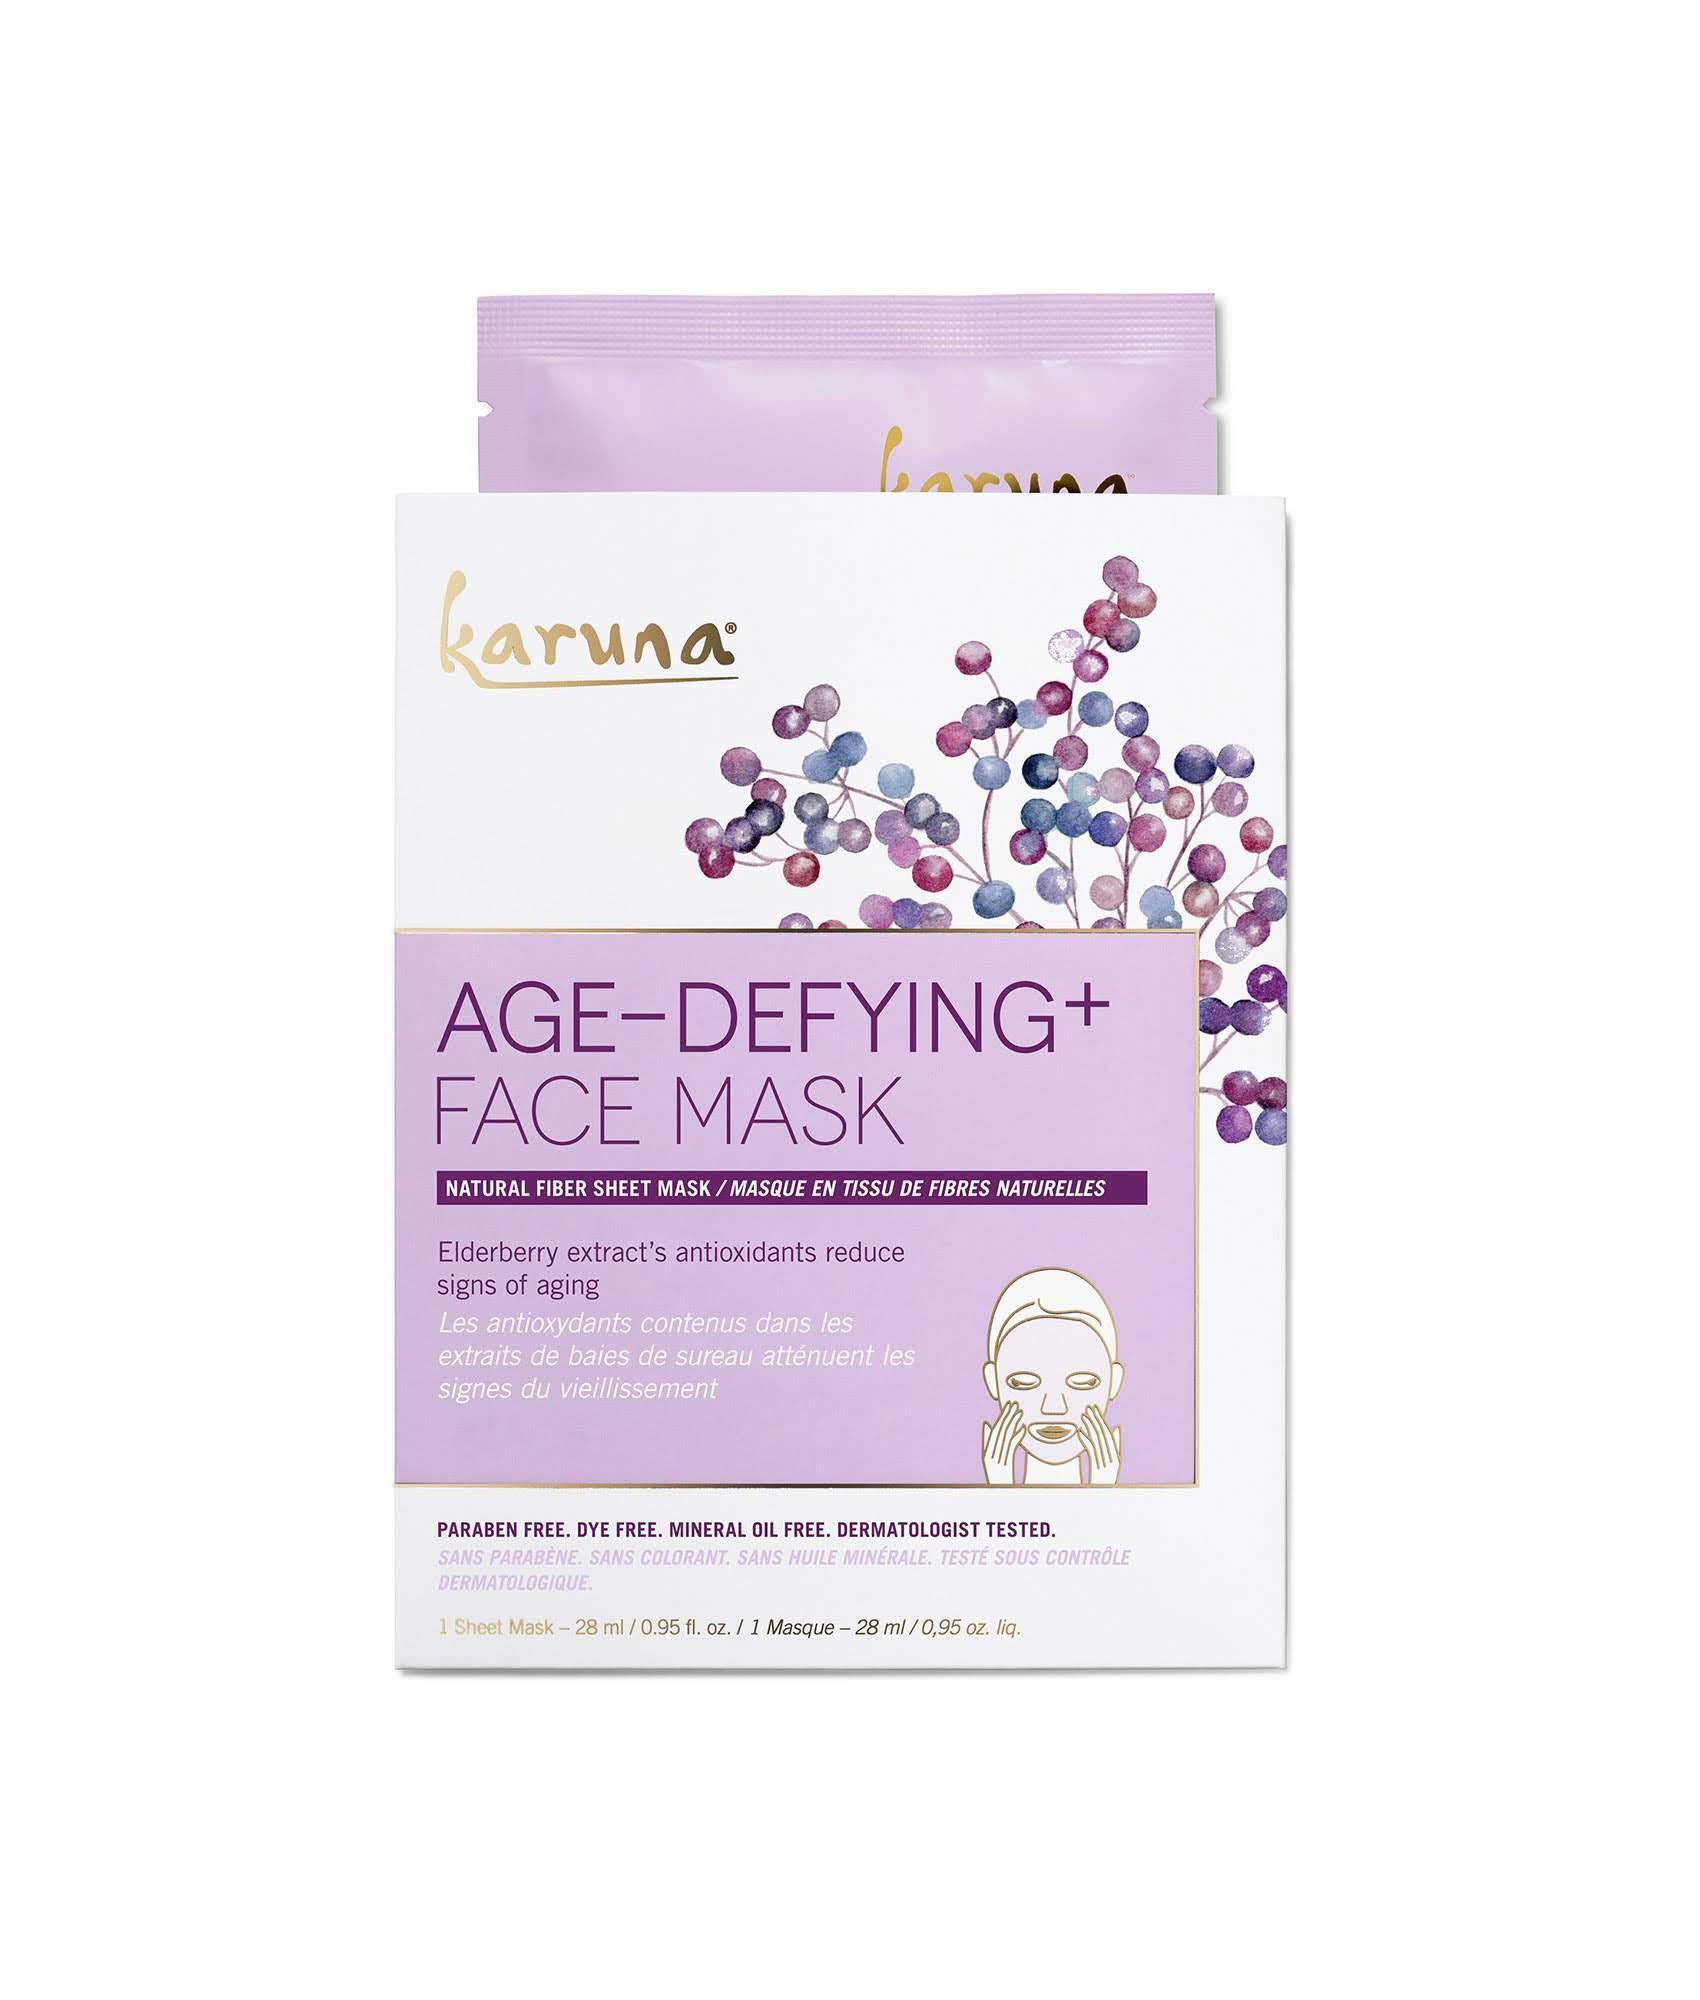 Karuna Age Defying+ Face Mask